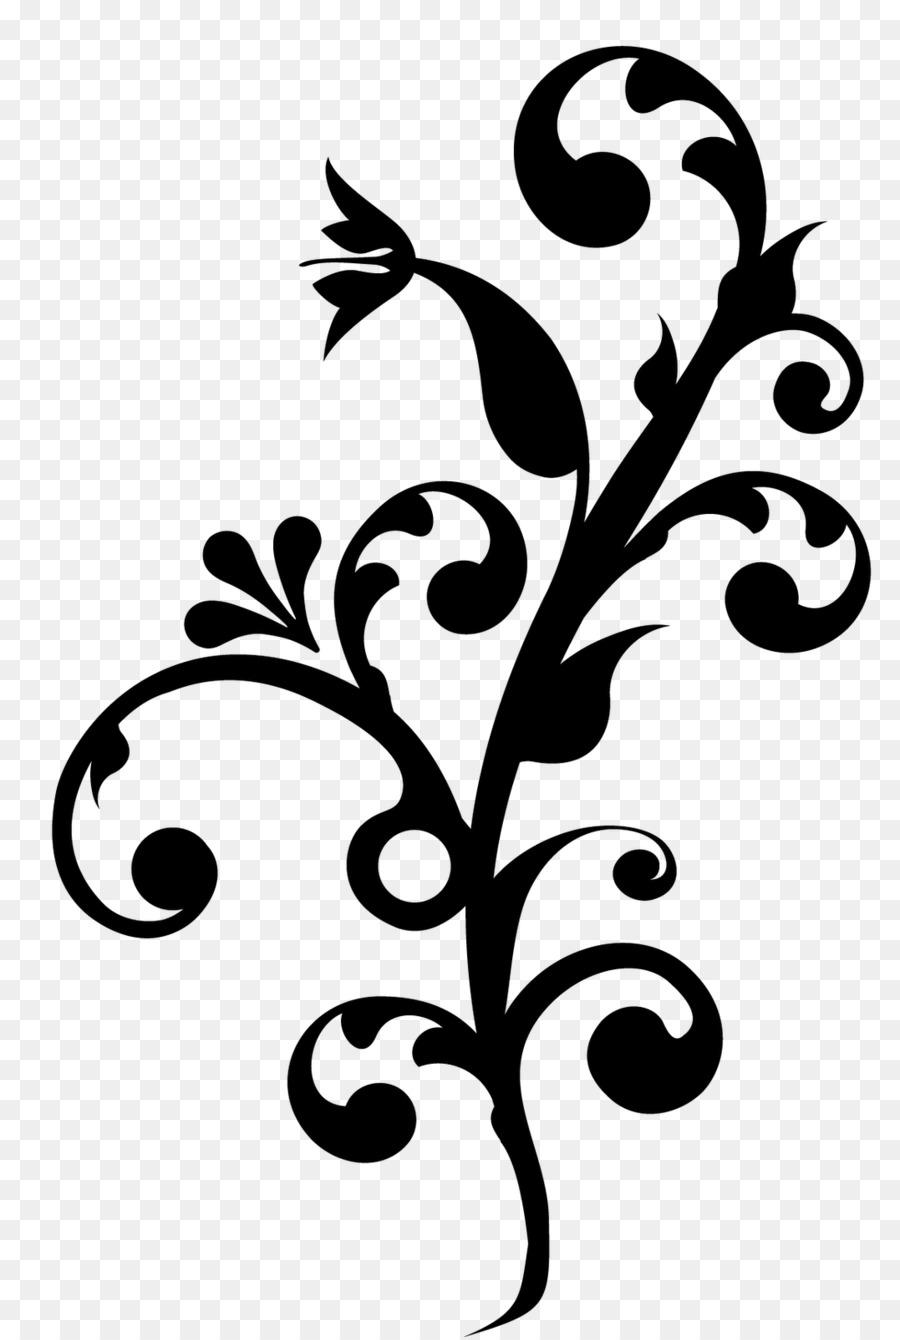 Flower Clip Art Batik Png Download 10771600 Free Transparent